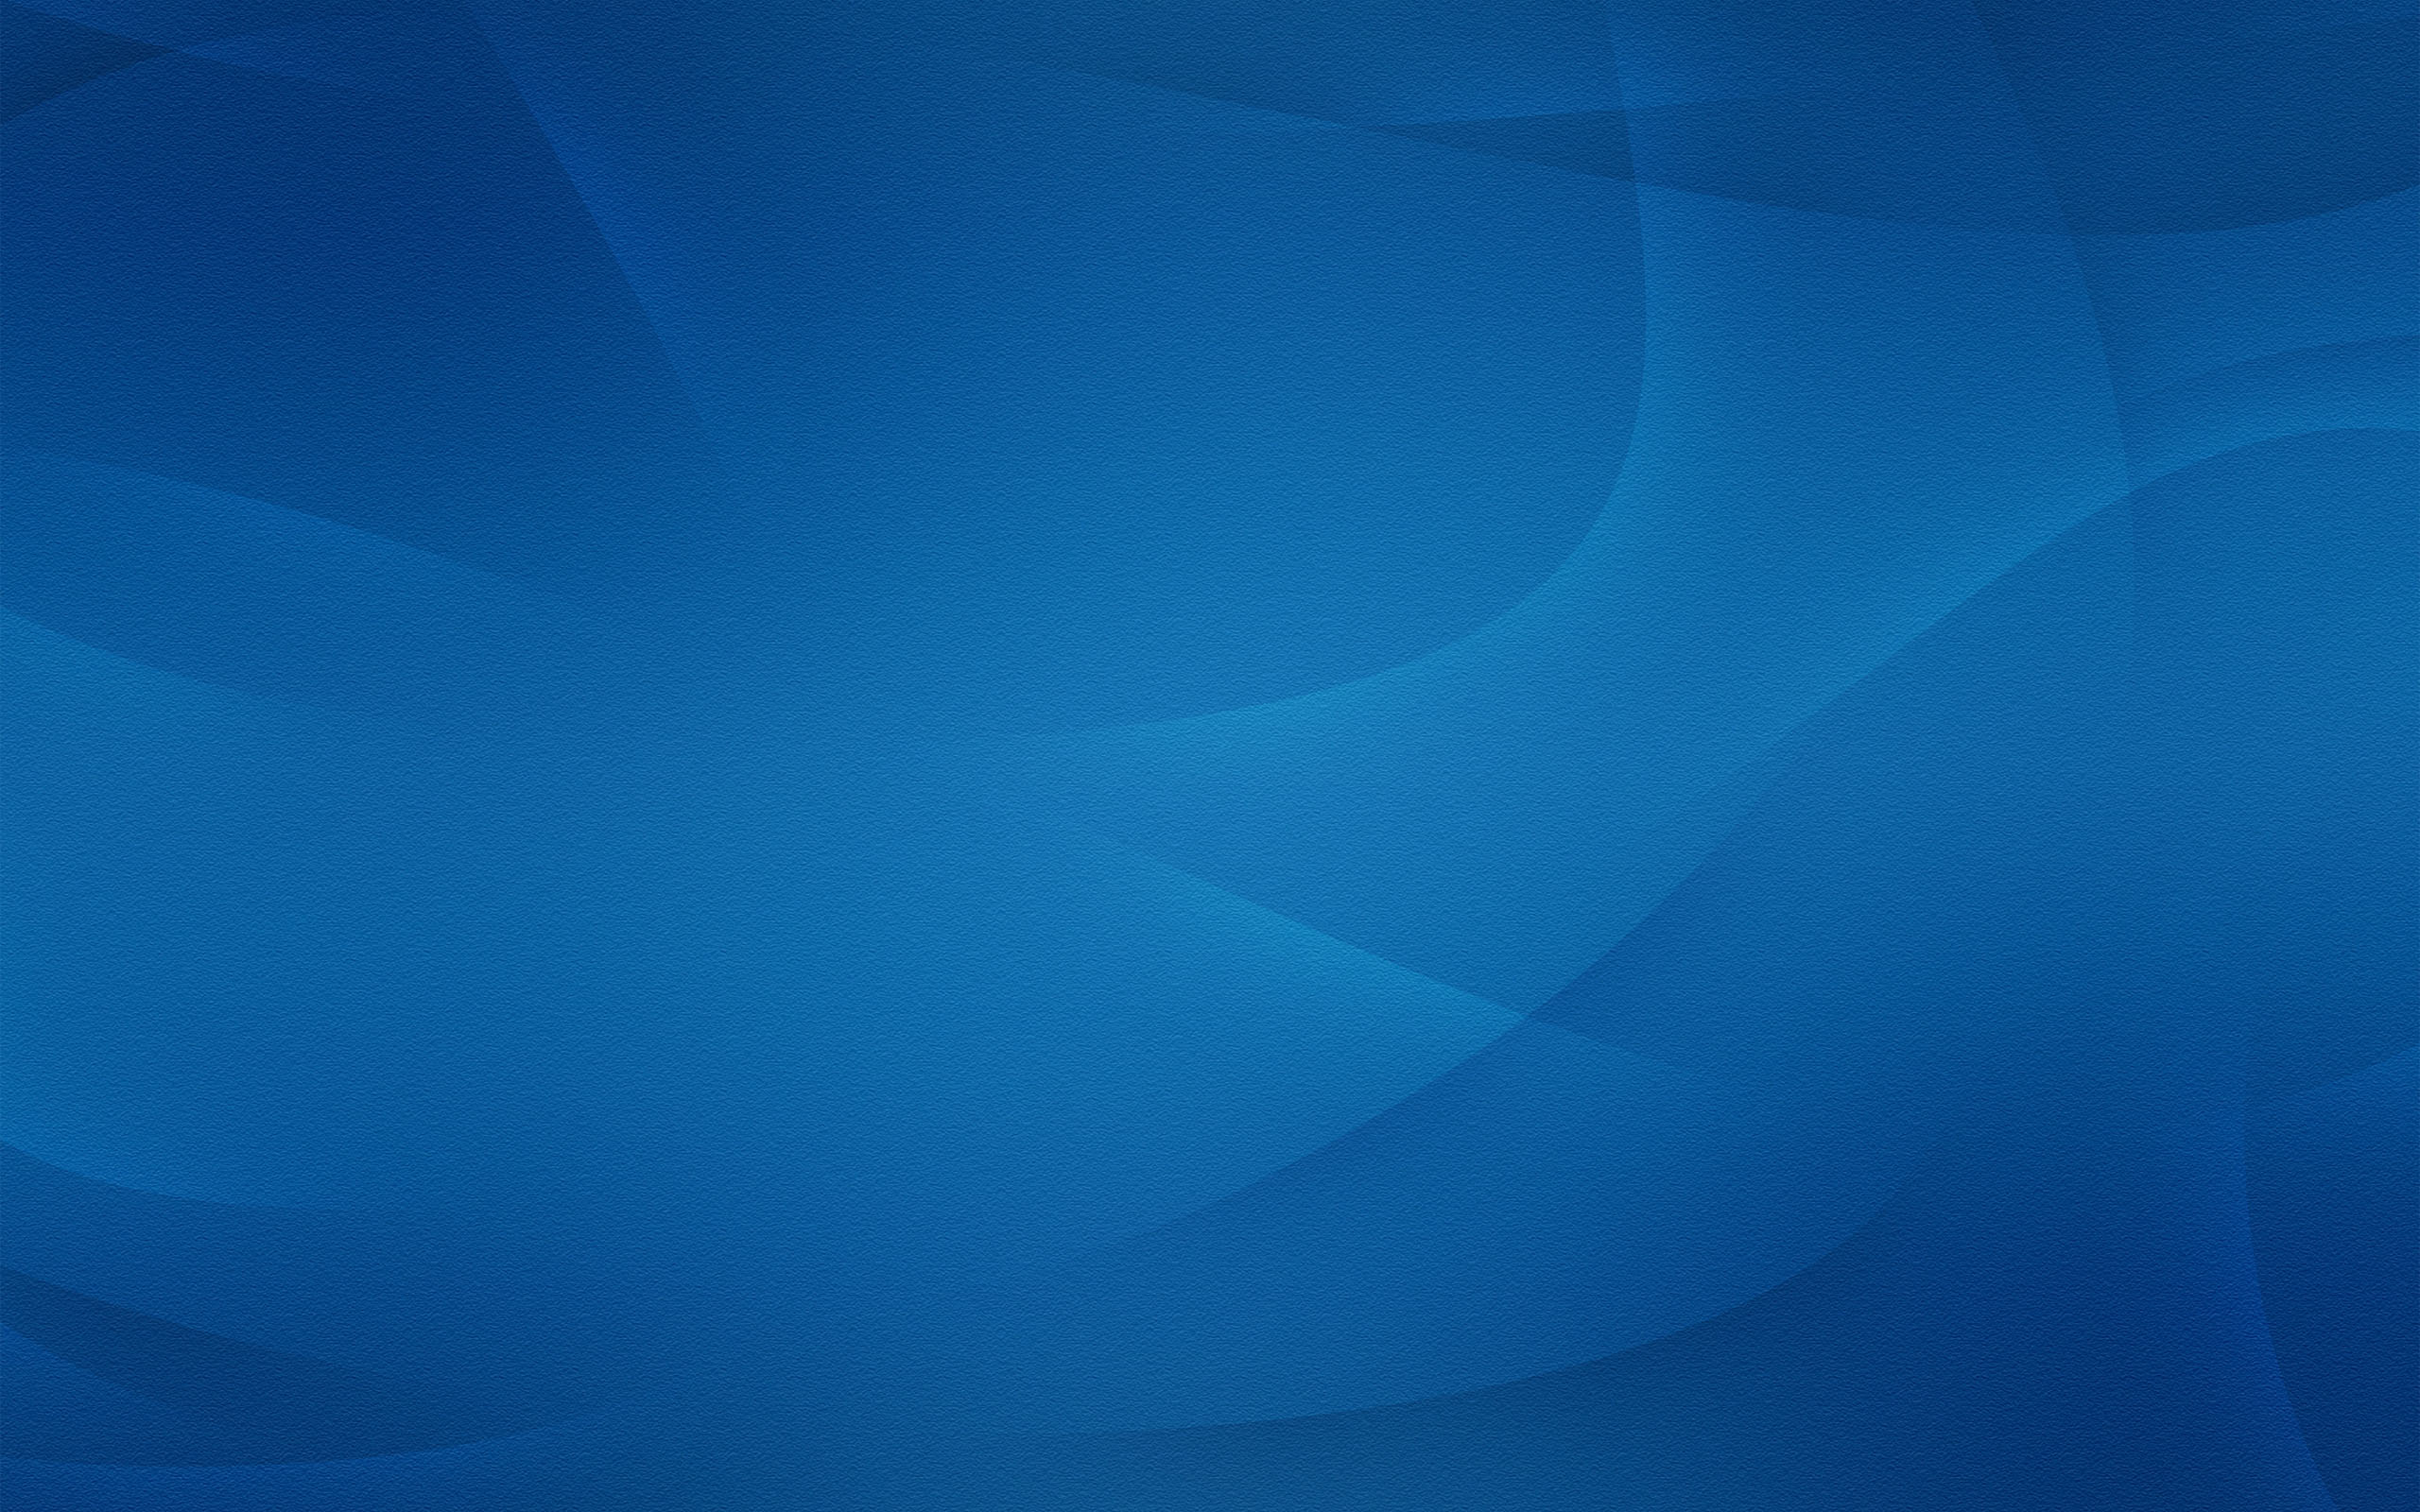 Desktop Wallpapers HD Apple Mac Abstract Desktop Blue Aquawave Desktop 2560x1600